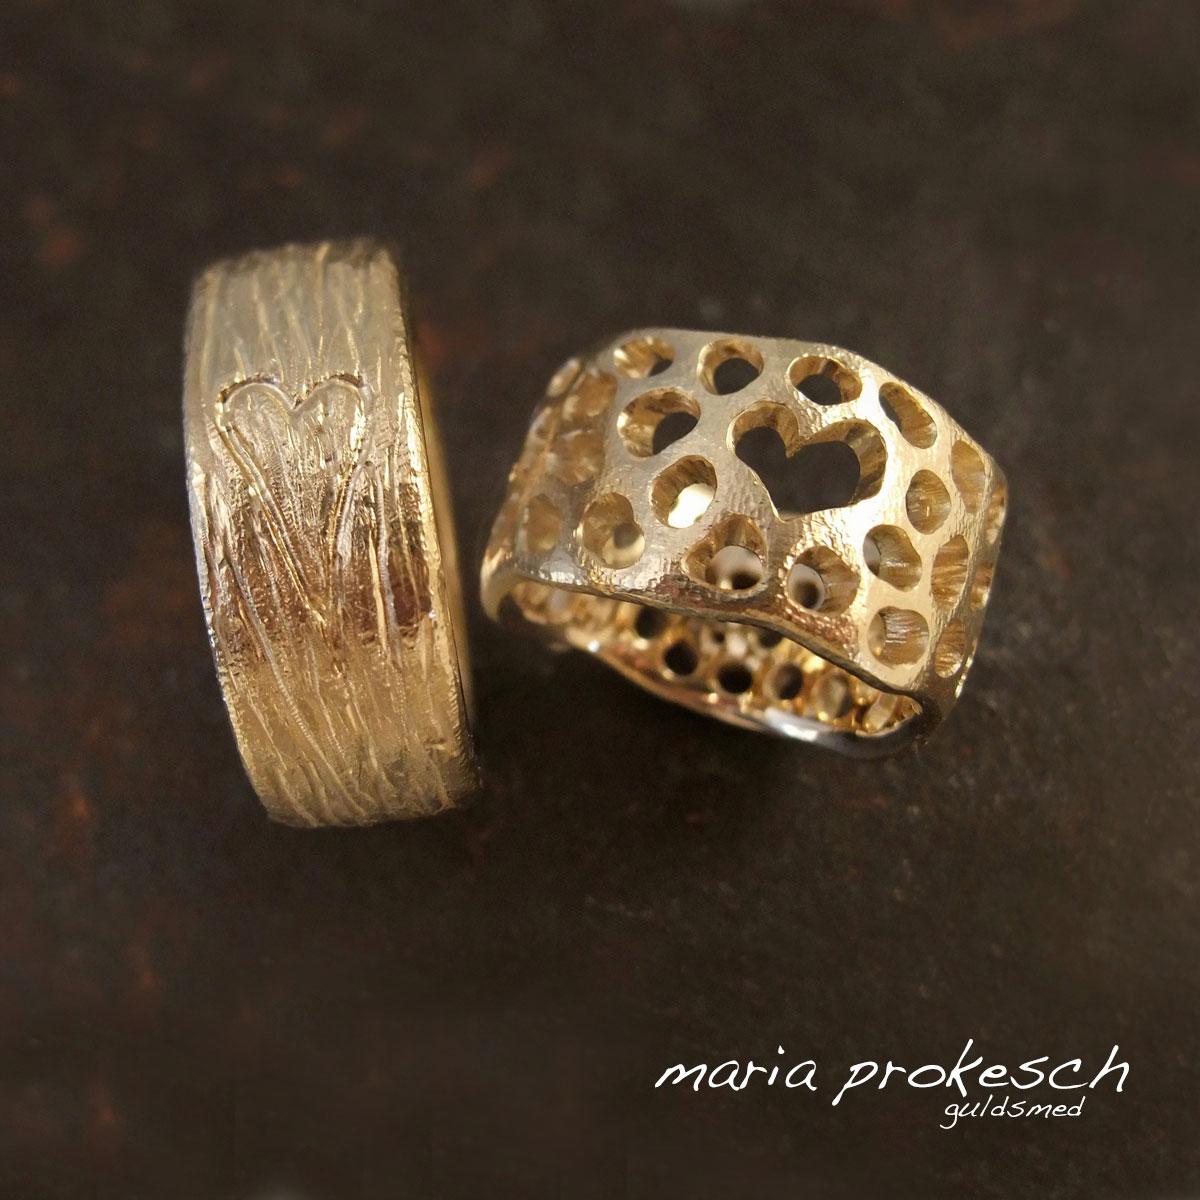 Vielsesringe i 14 kt gult guld. Rå, naturlige og rustikke med udsavet personligt hjerte i hendes, hans ring med natur rå bark overflade og skjult hjerte